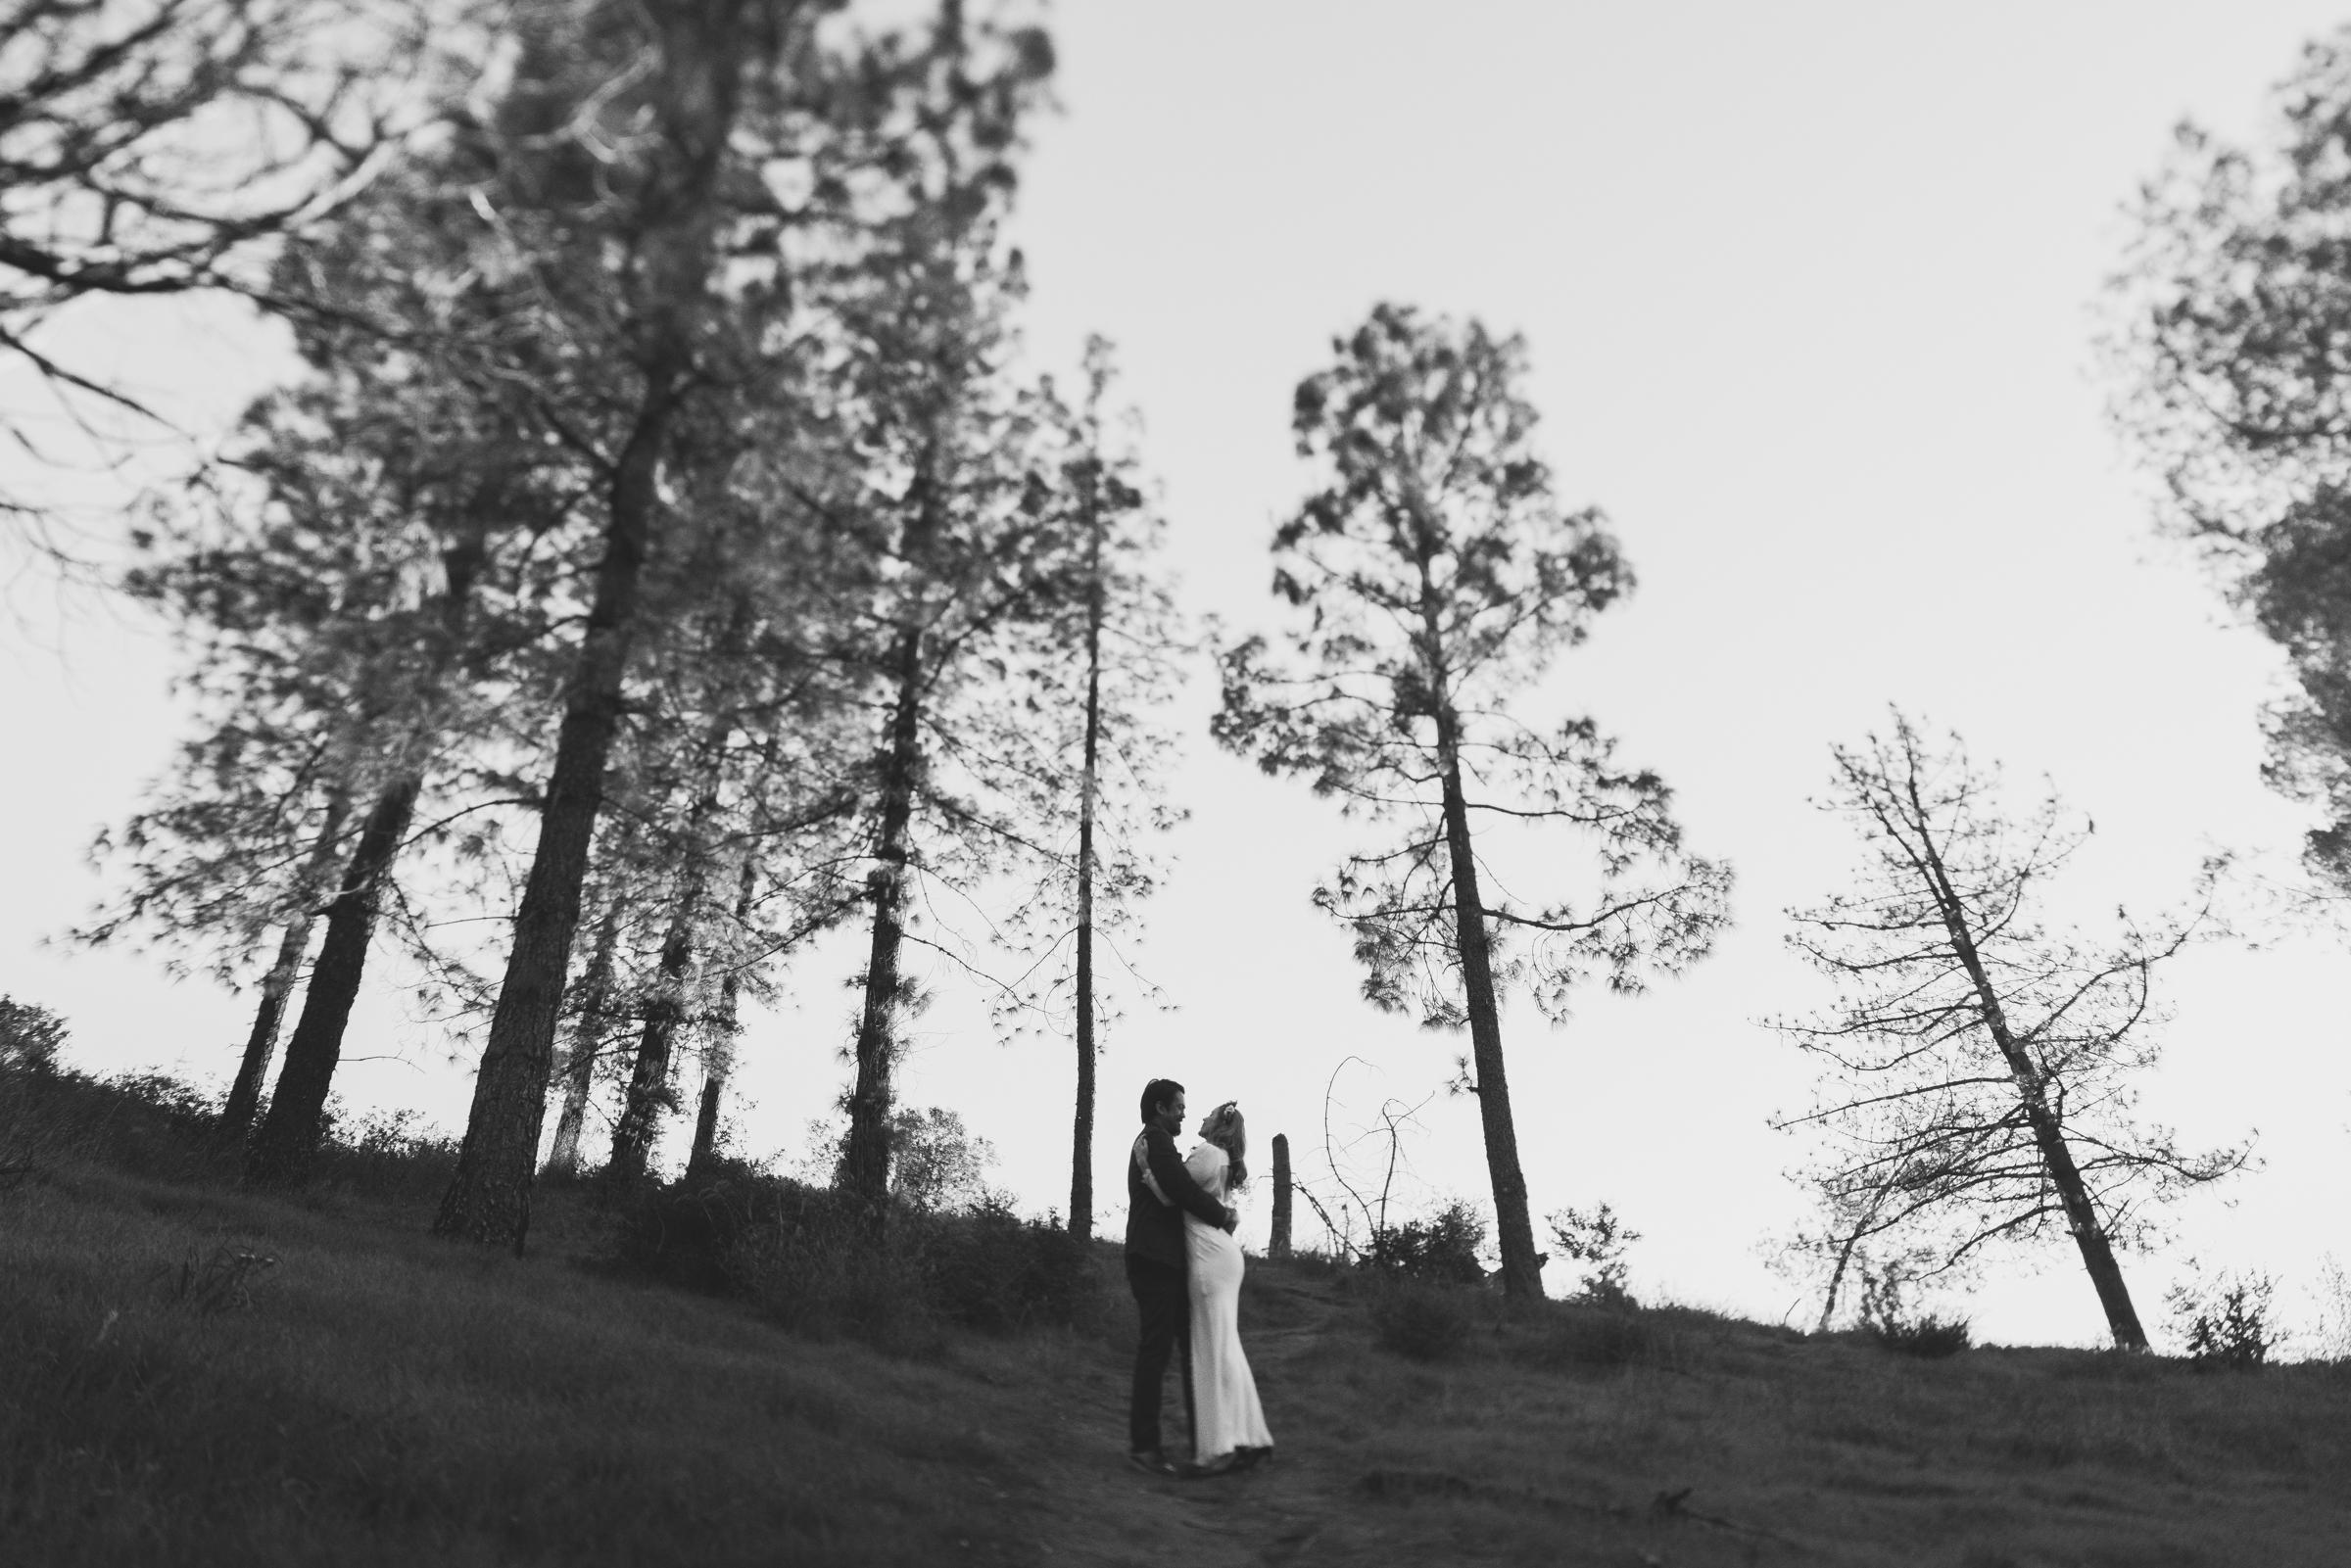 ©Isaiah + Taylor Photography - Intimate Elopement, Eaton Canyon, Los Angeles Wedding Photographer-61.jpg